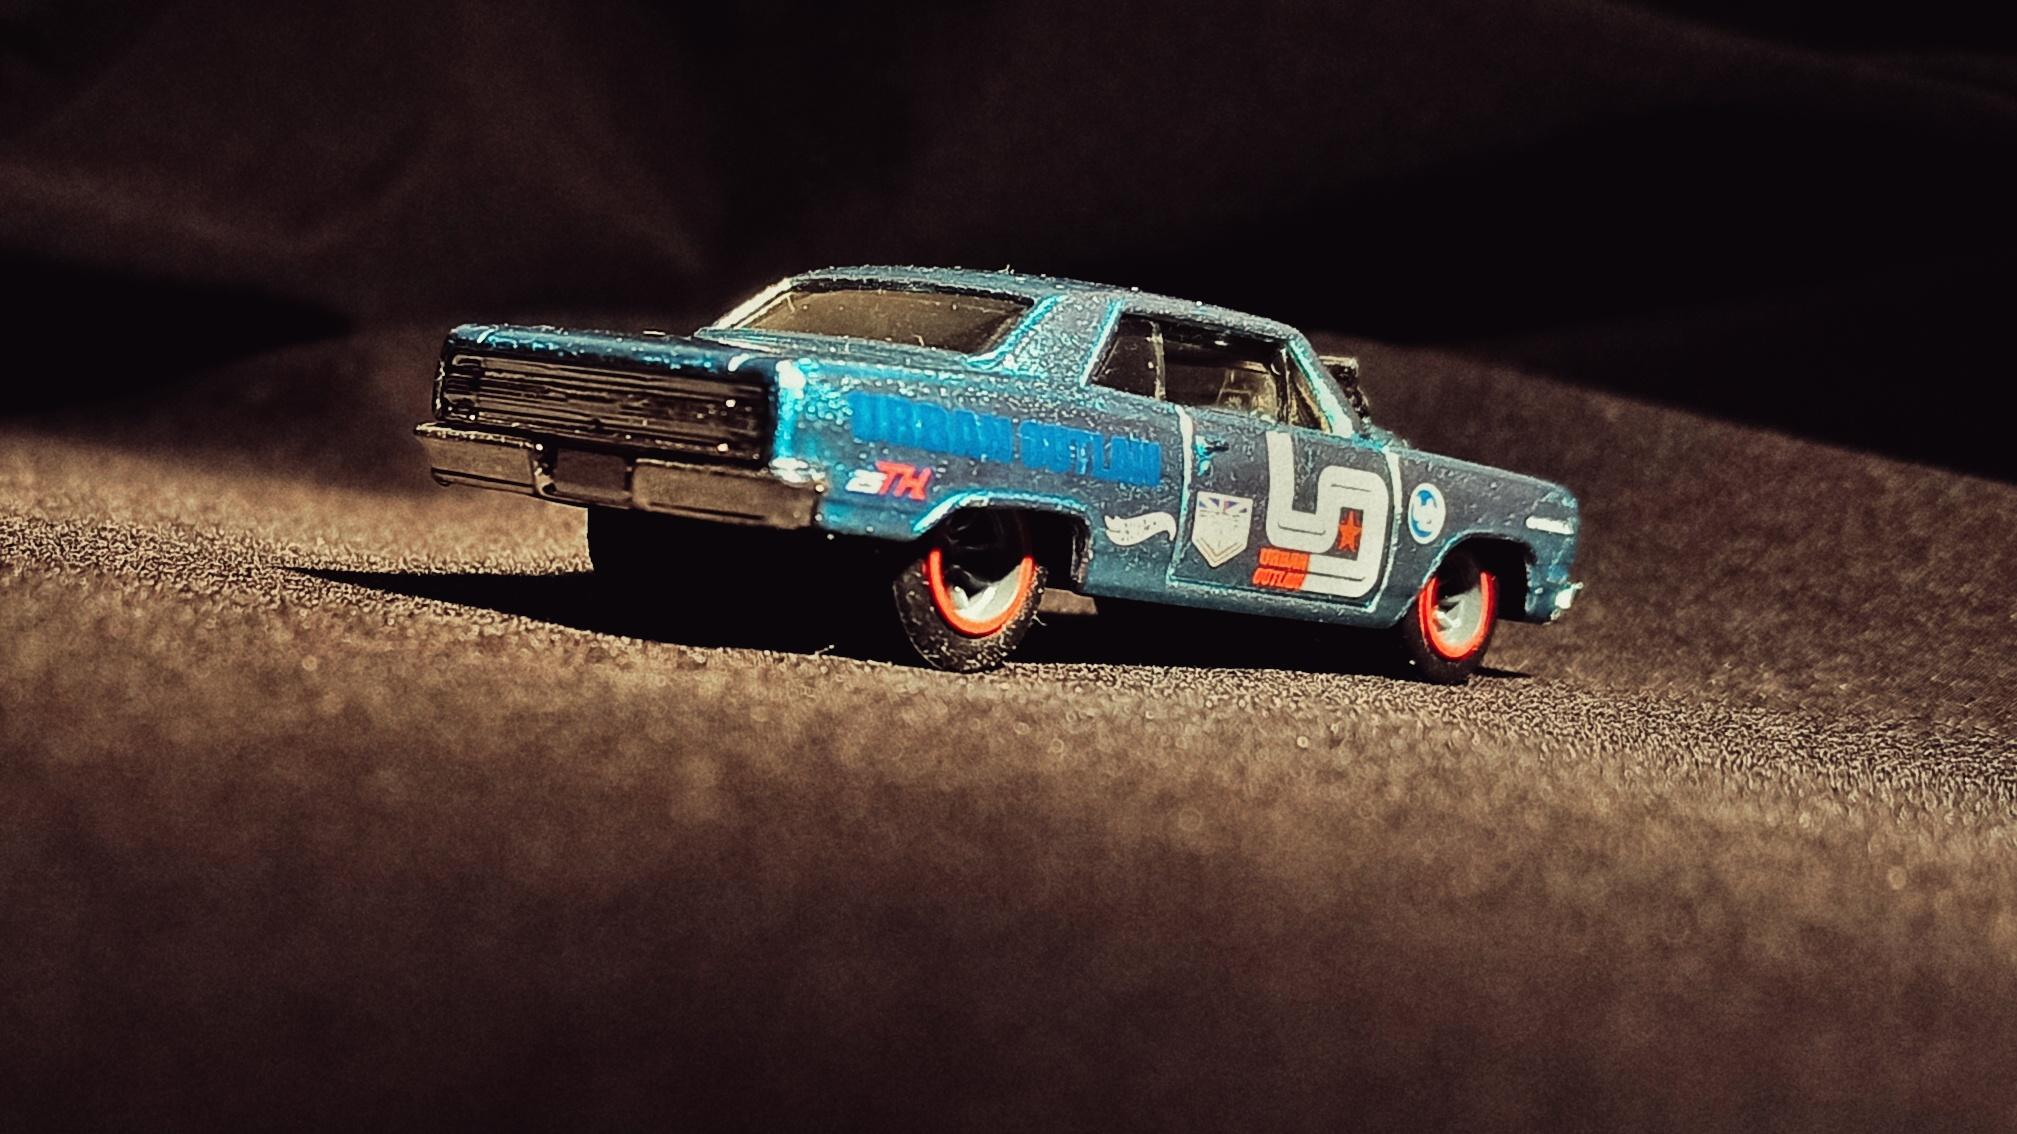 Hot Wheels '64 Chevy Chevelle SS (GHG25) 2020 (247/250) Nightburnerz (10/10) spectraflame light blue Magnus Walker Urban Outlaw Super Treasure Hunt (STH) side angle